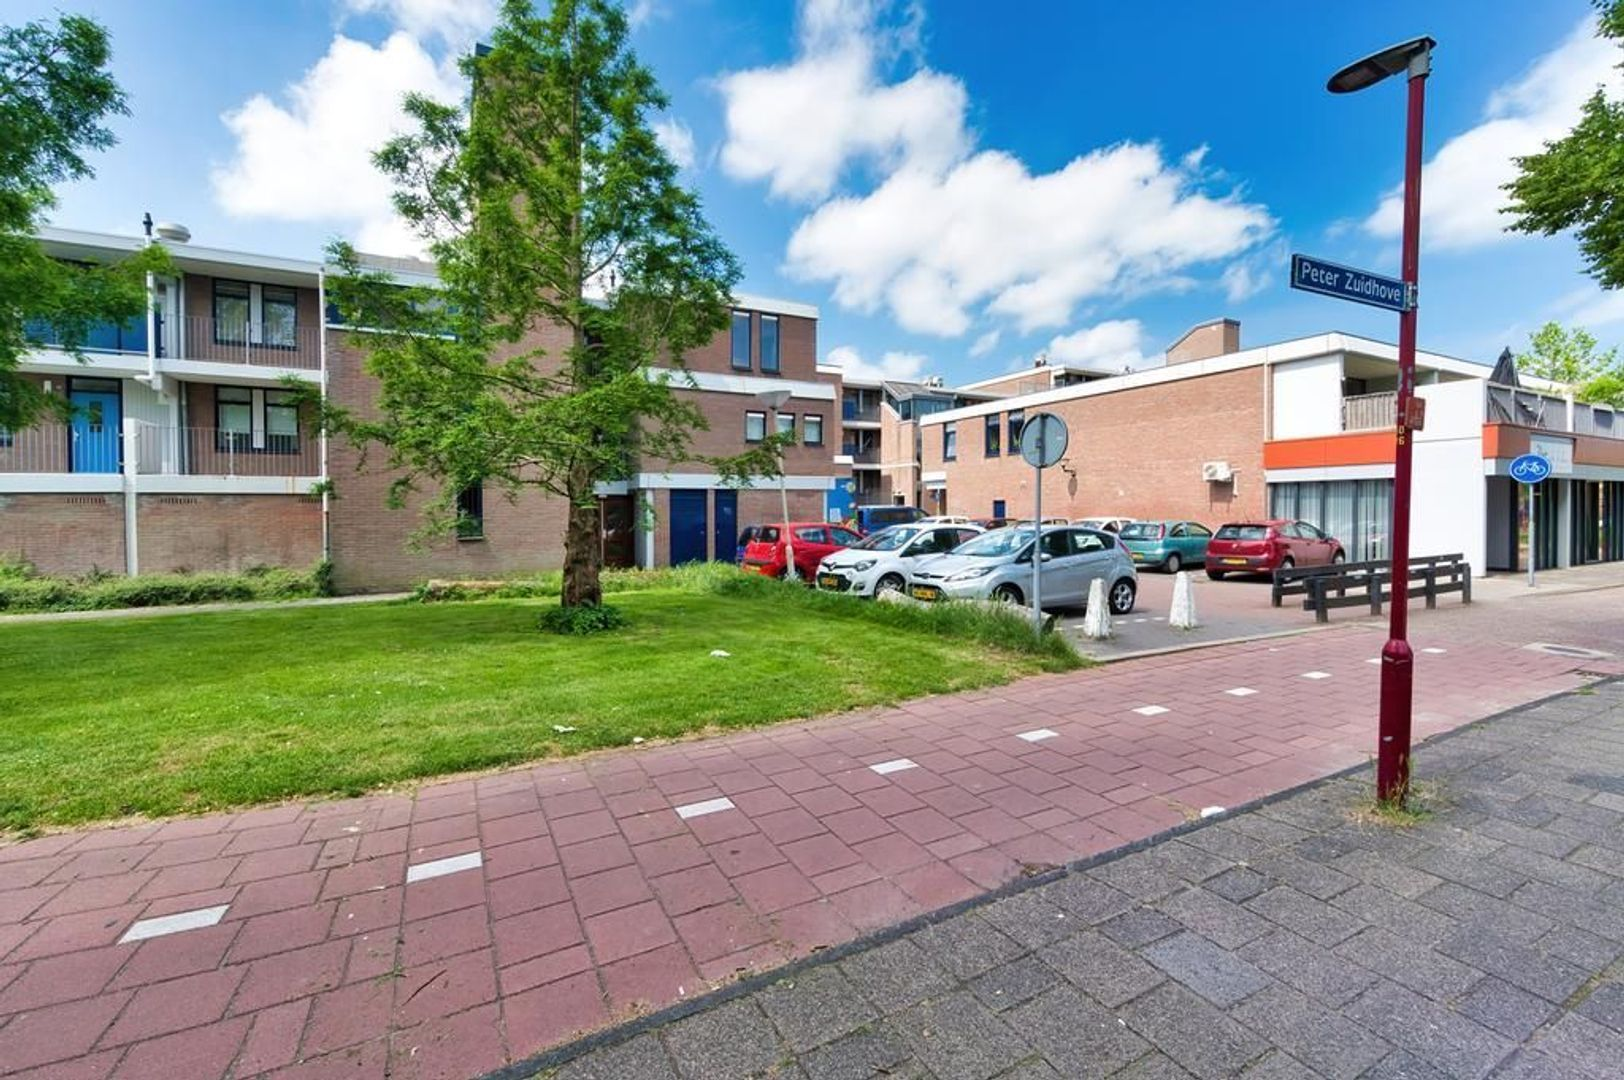 Peter Zuidhove 107, Zoetermeer foto-25 blur